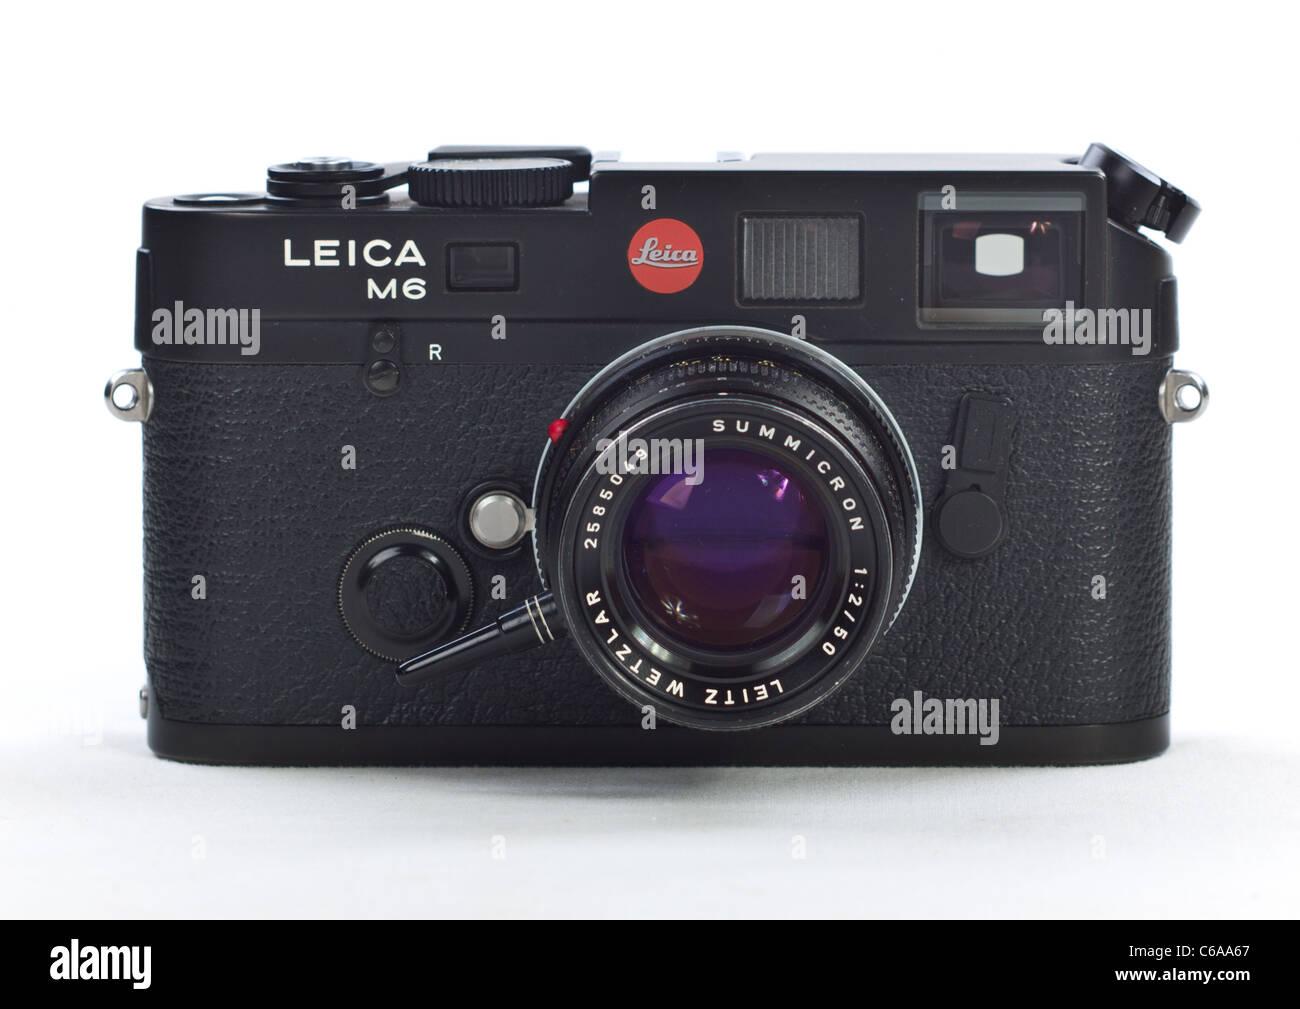 Leica Mit Entfernungsmesser : Leica m ttl entfernungsmesser rf mm filmkamera mit classic